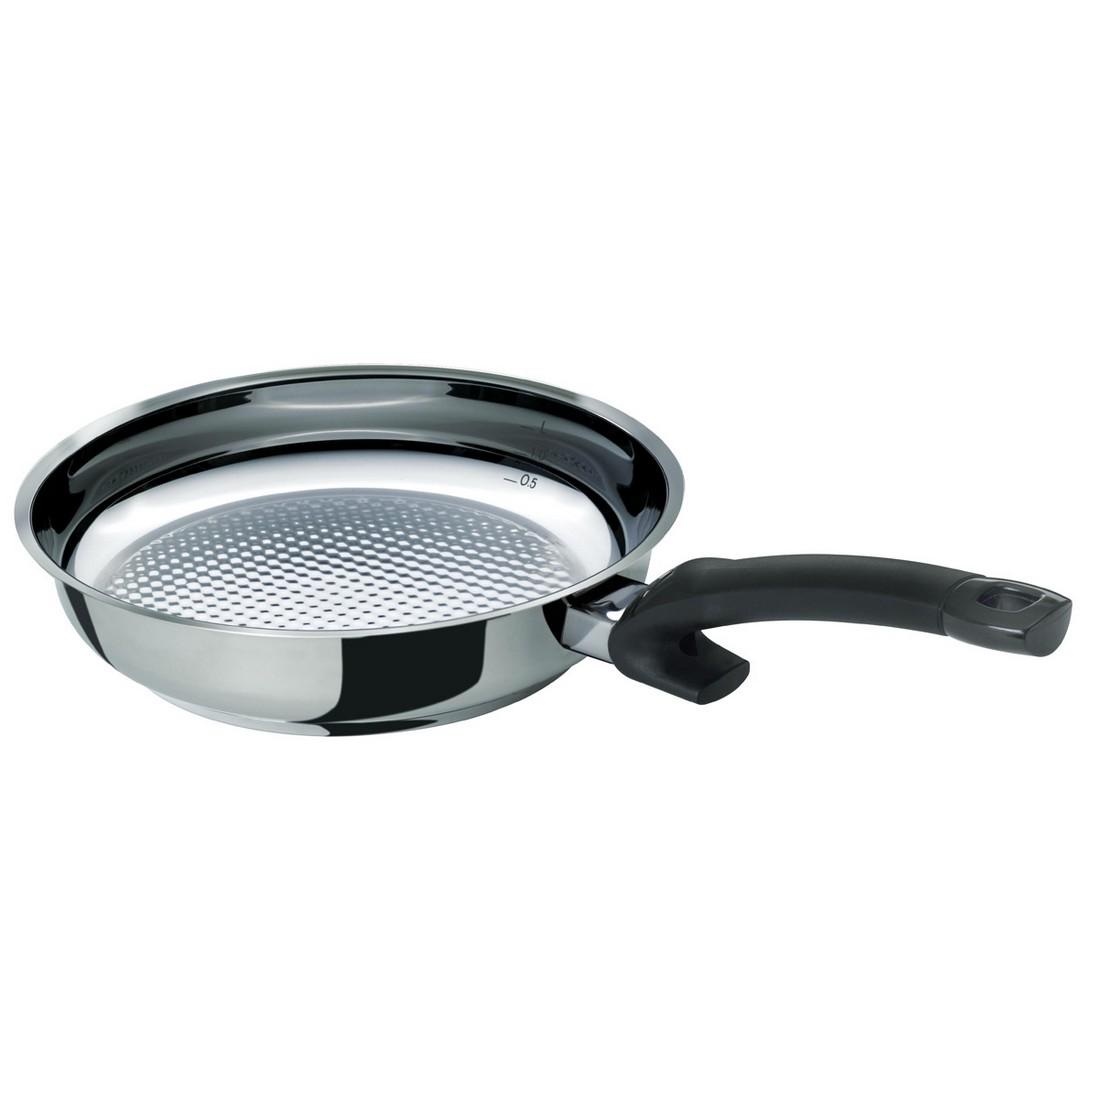 Pfanne Crispy Steelux Comfort – 28 cm, silber, Fissler bestellen